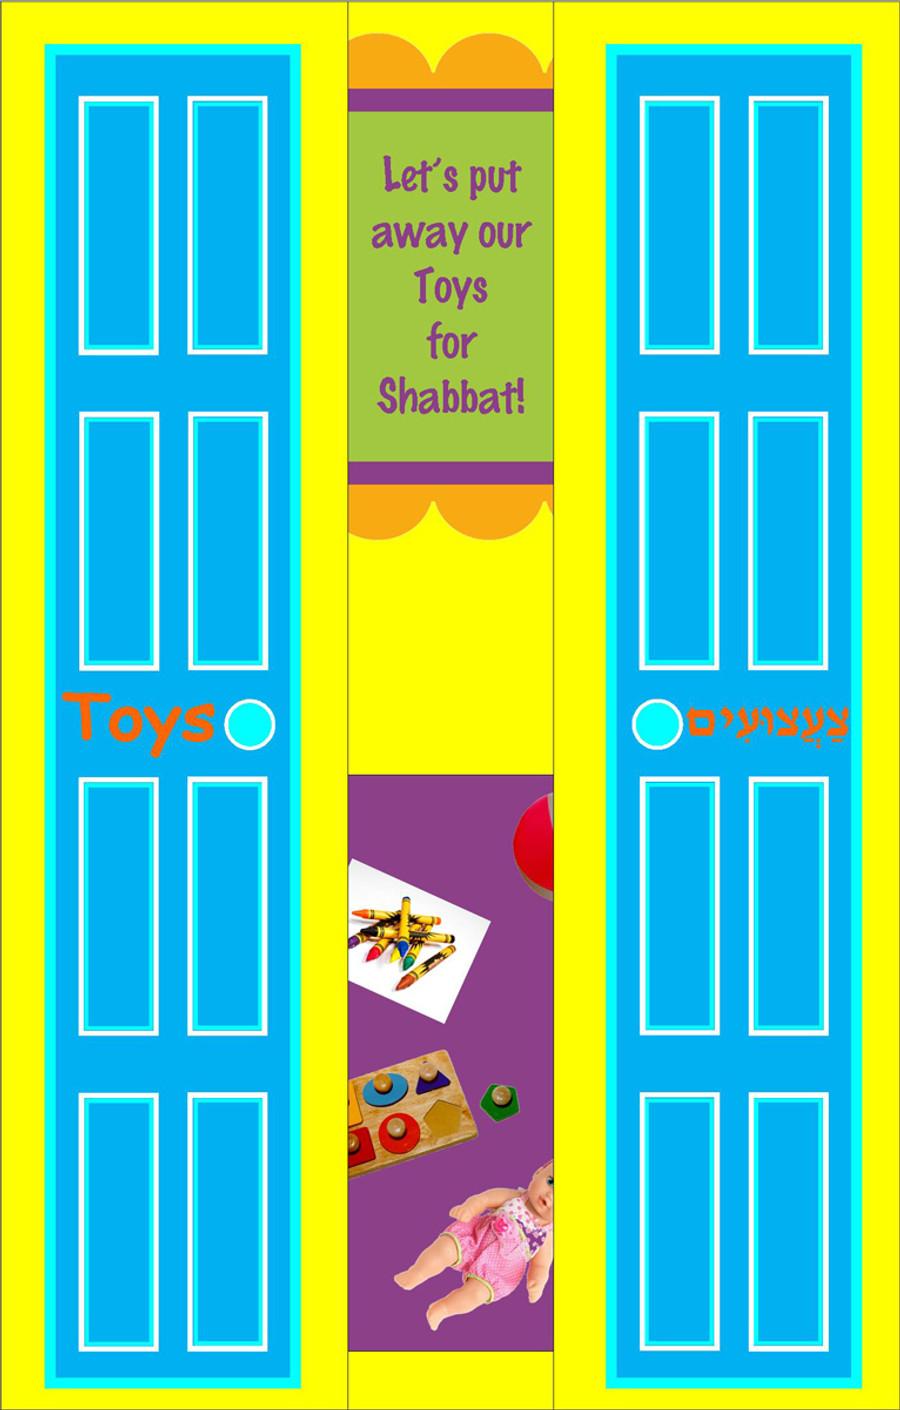 Shabbat Toys